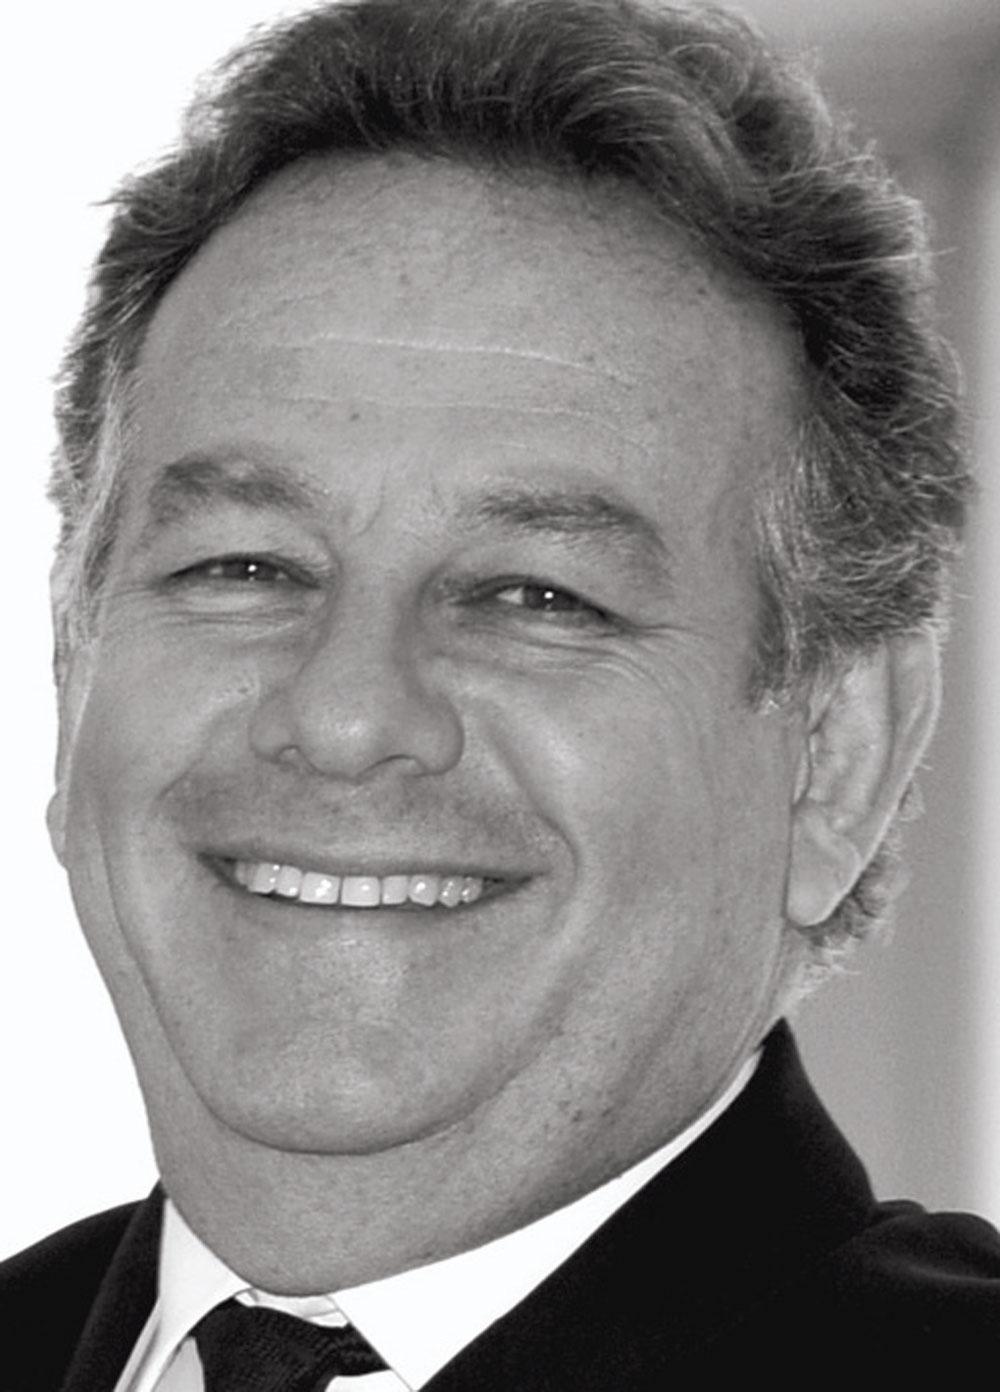 Paul roll directeur g n ral de l office de tourisme et - Office de tourisme et des congres de paris ...